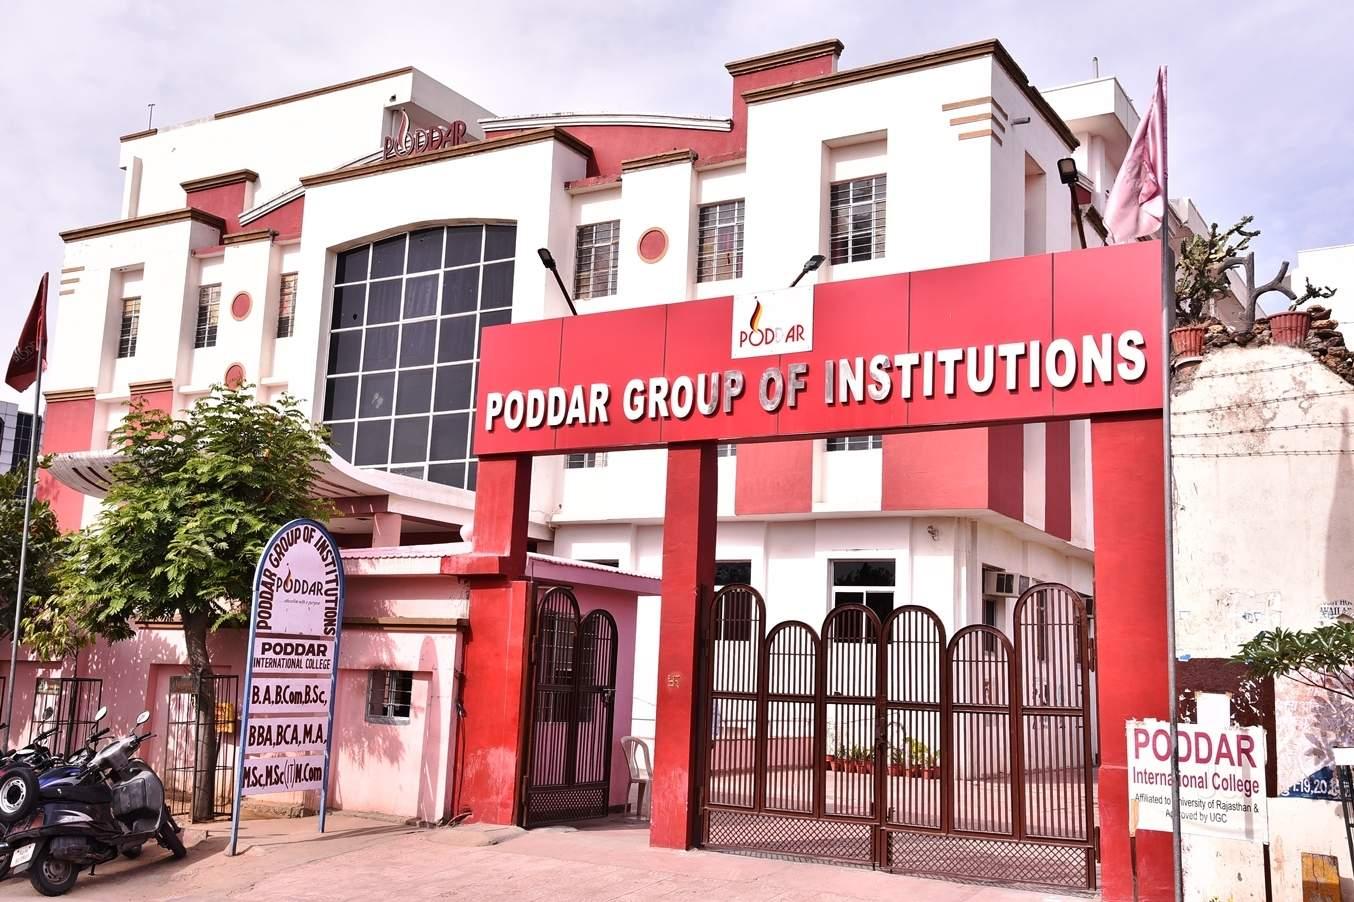 Poddar International College, Jaipur Image